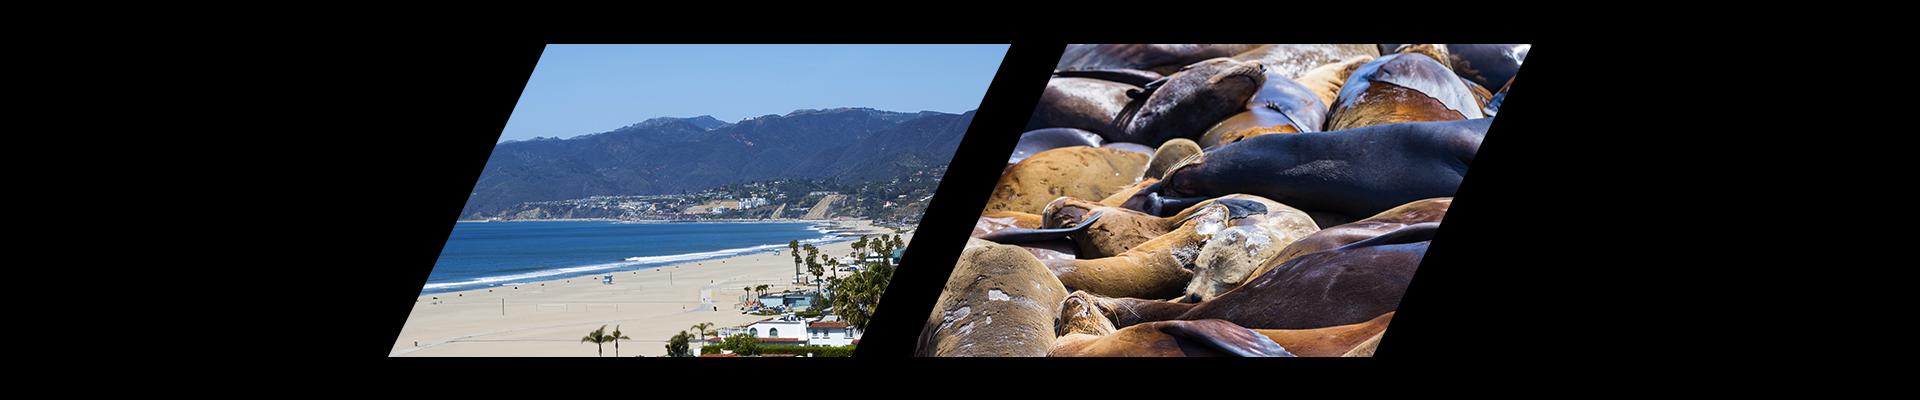 Santa Monica Beach and sea lions in California